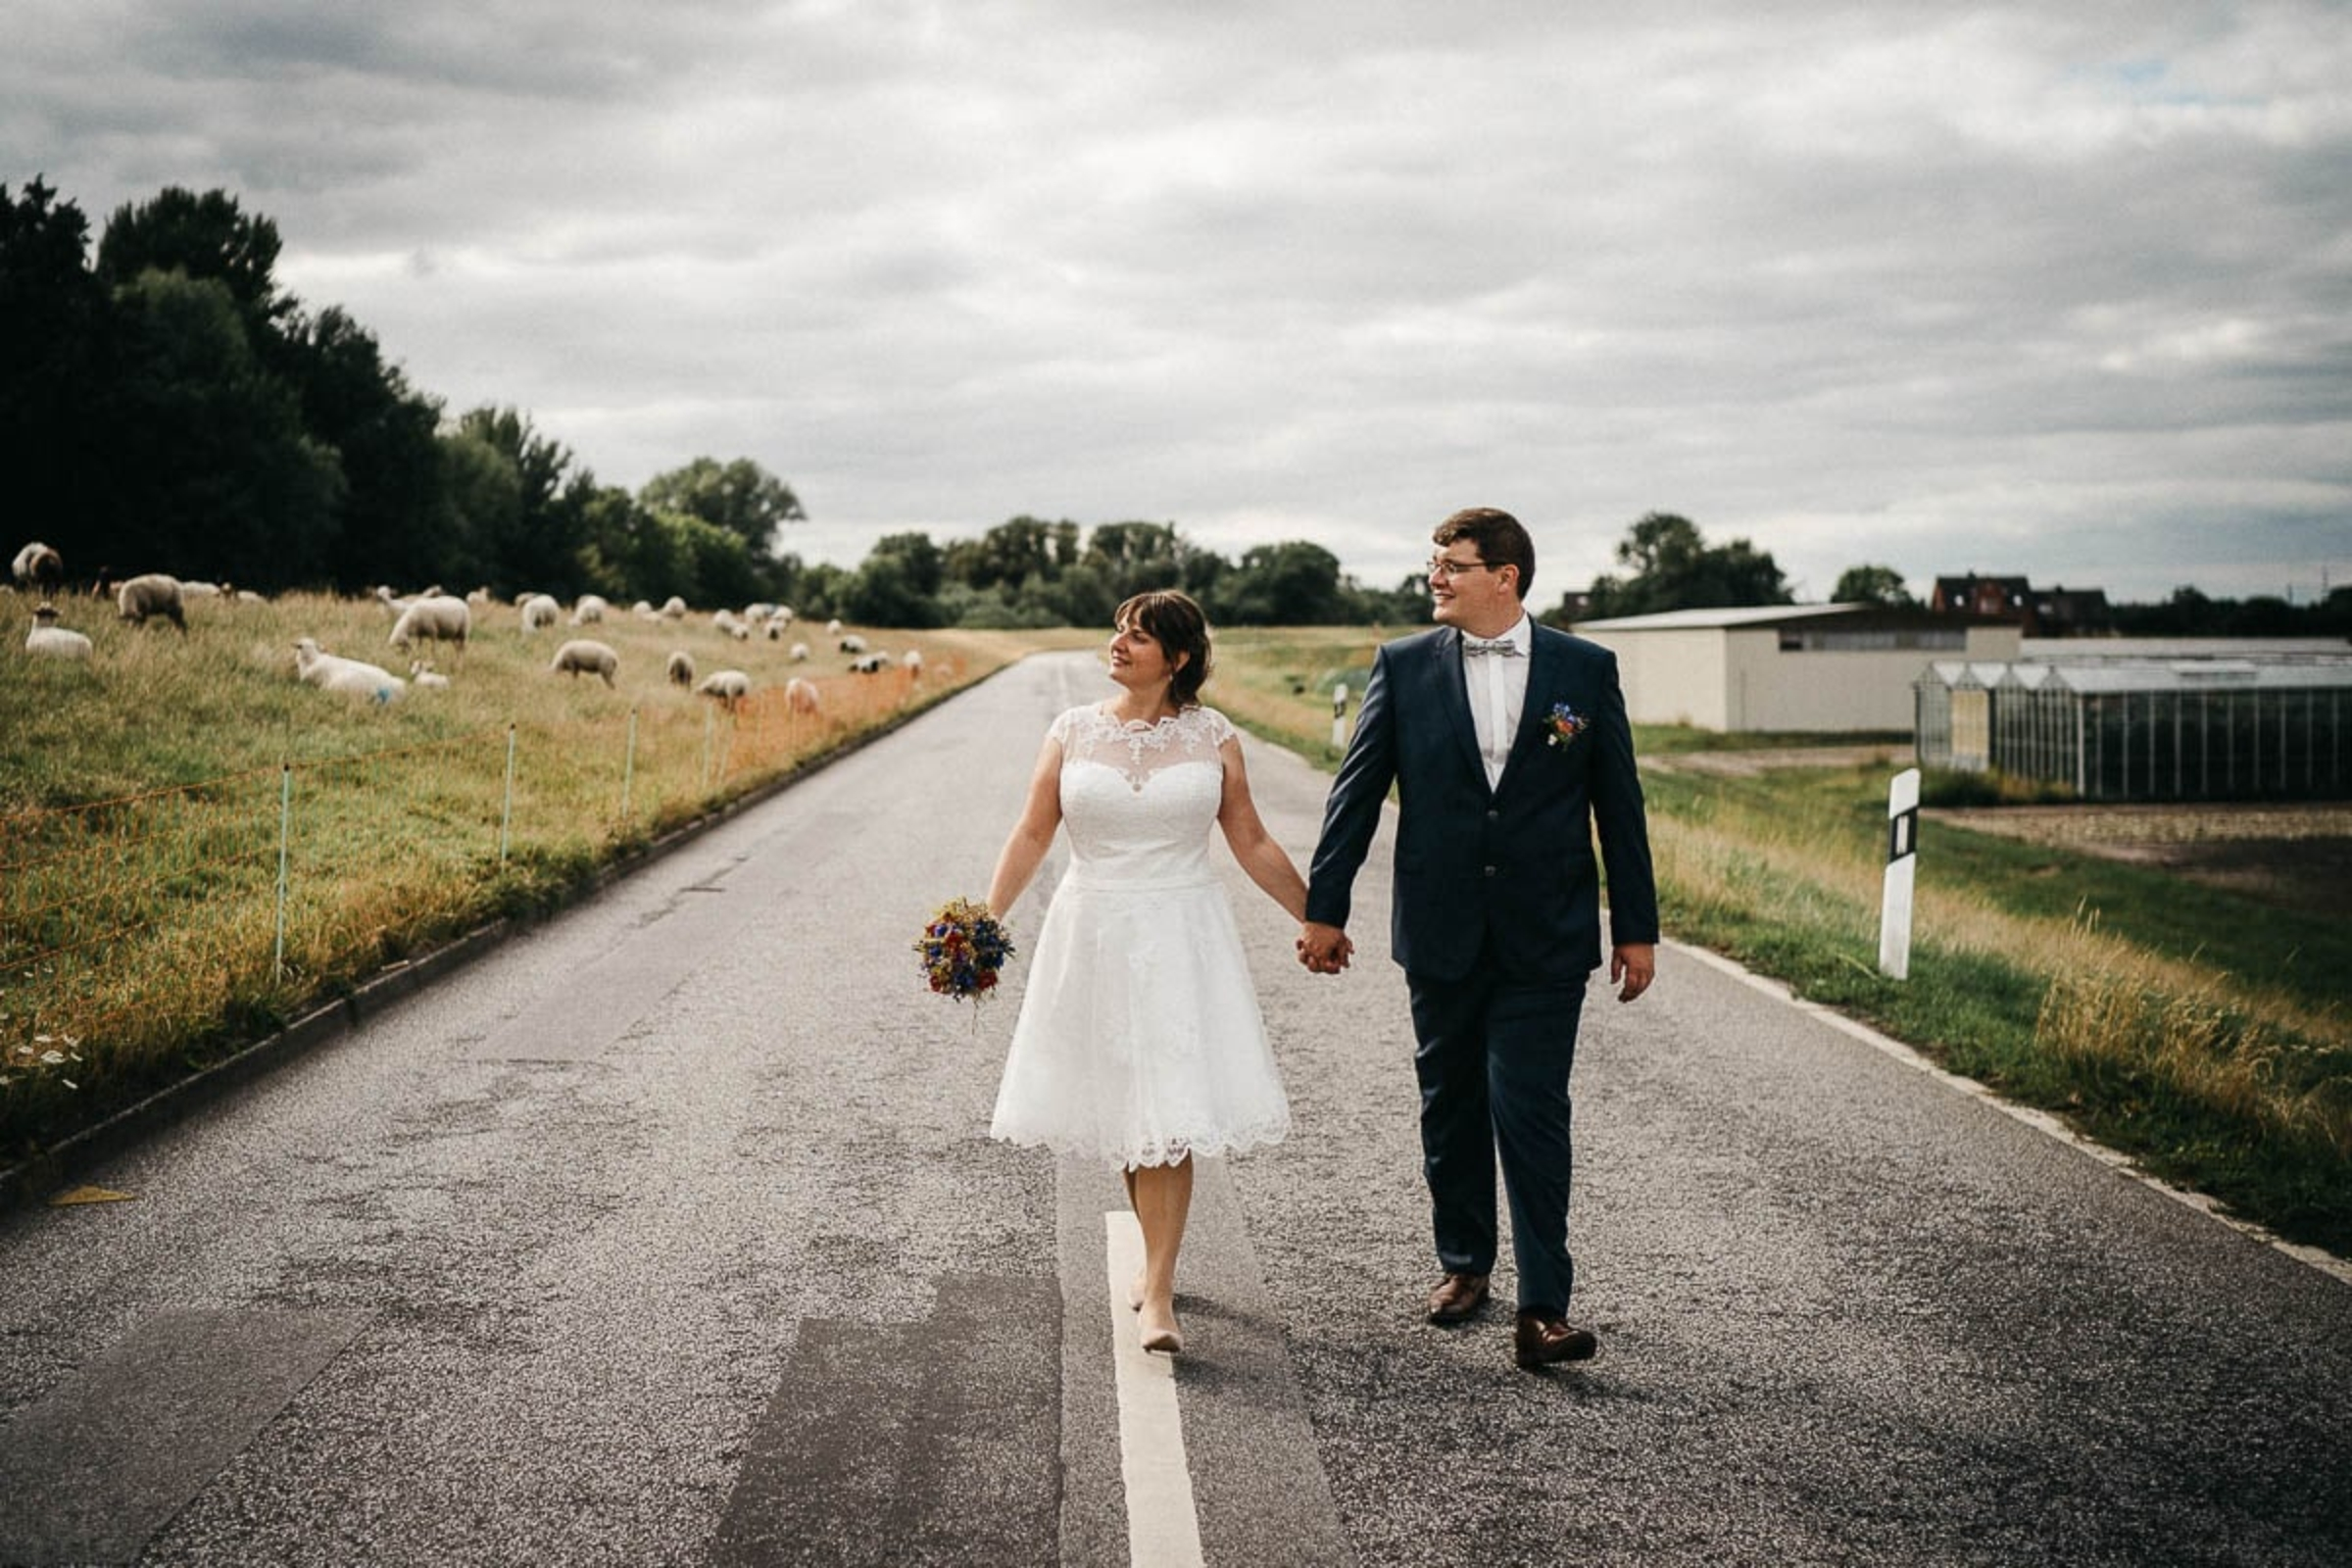 Hochzeitsfotograf-altesLand